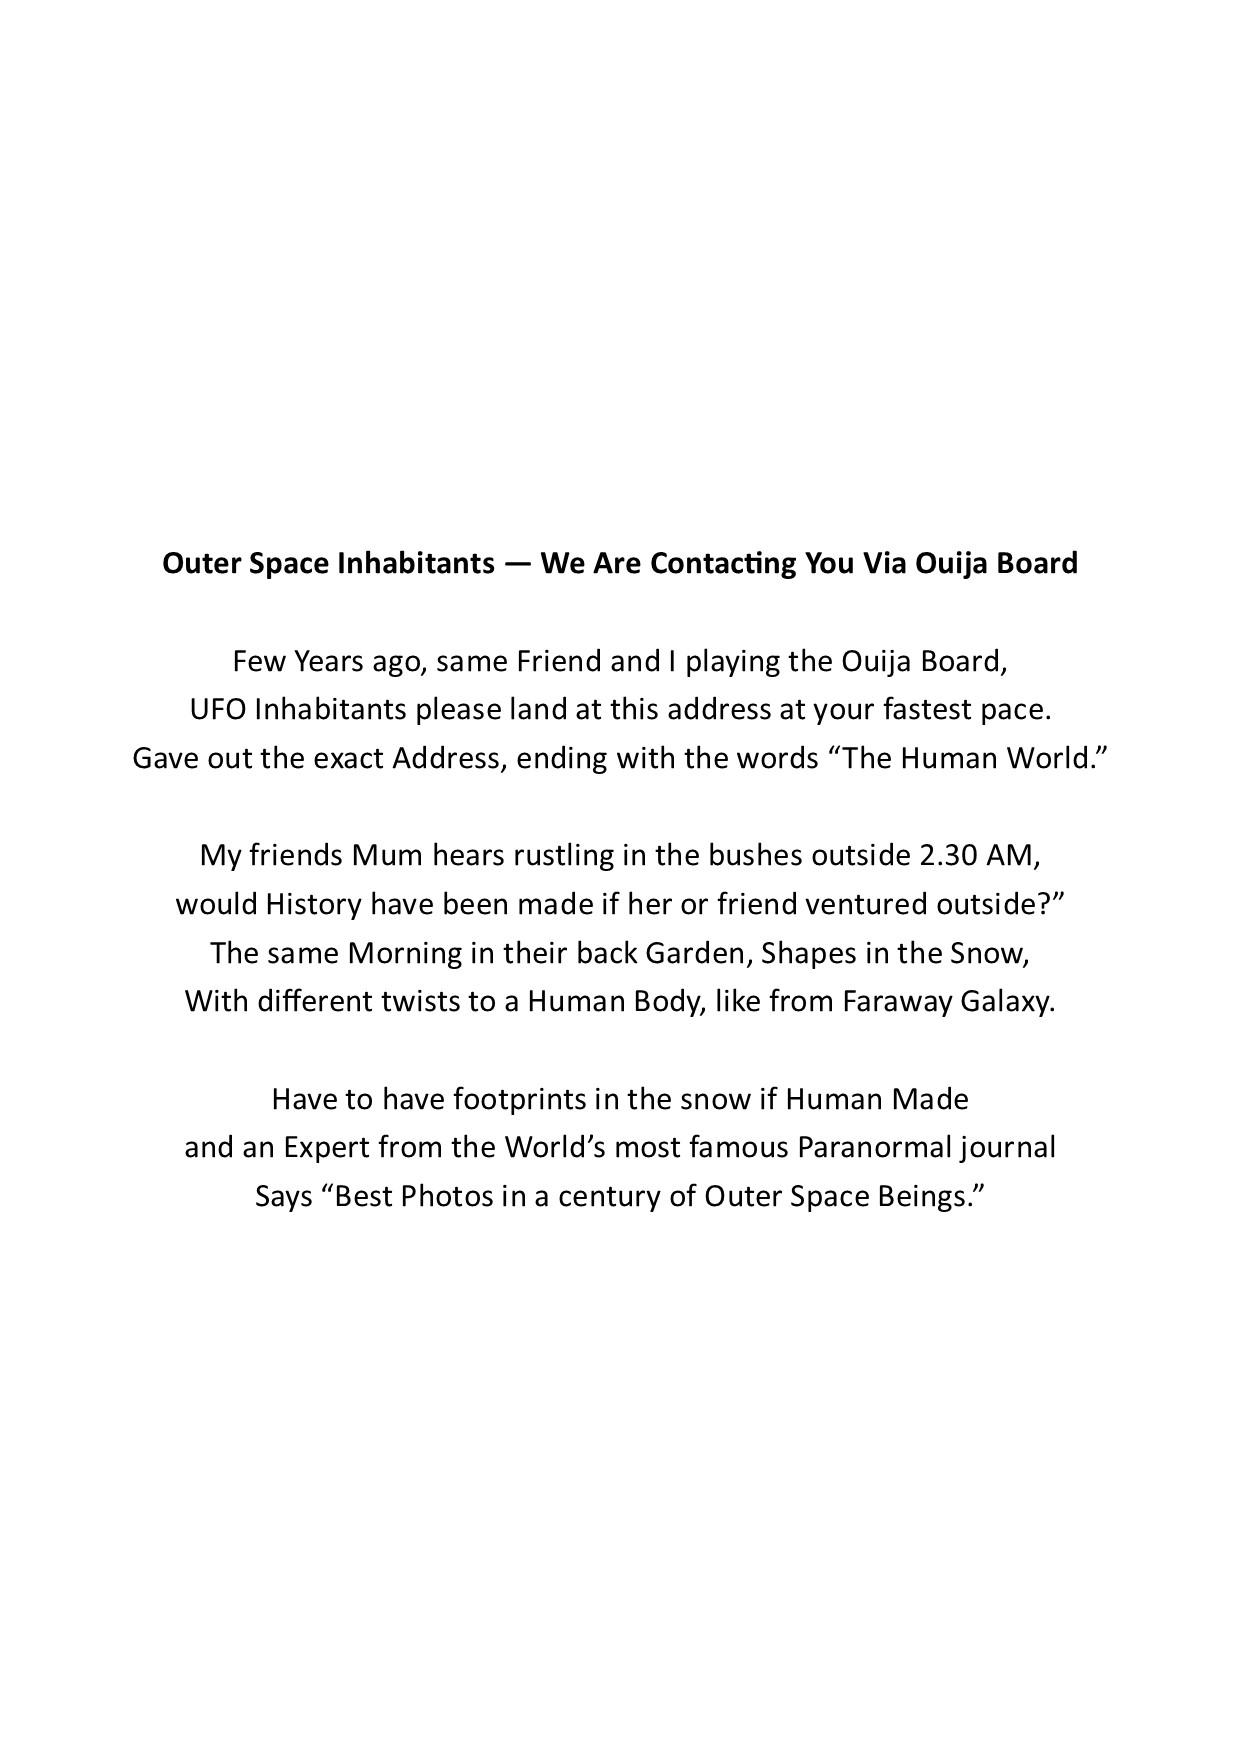 Outer Space Inhabitants_Website.jpg